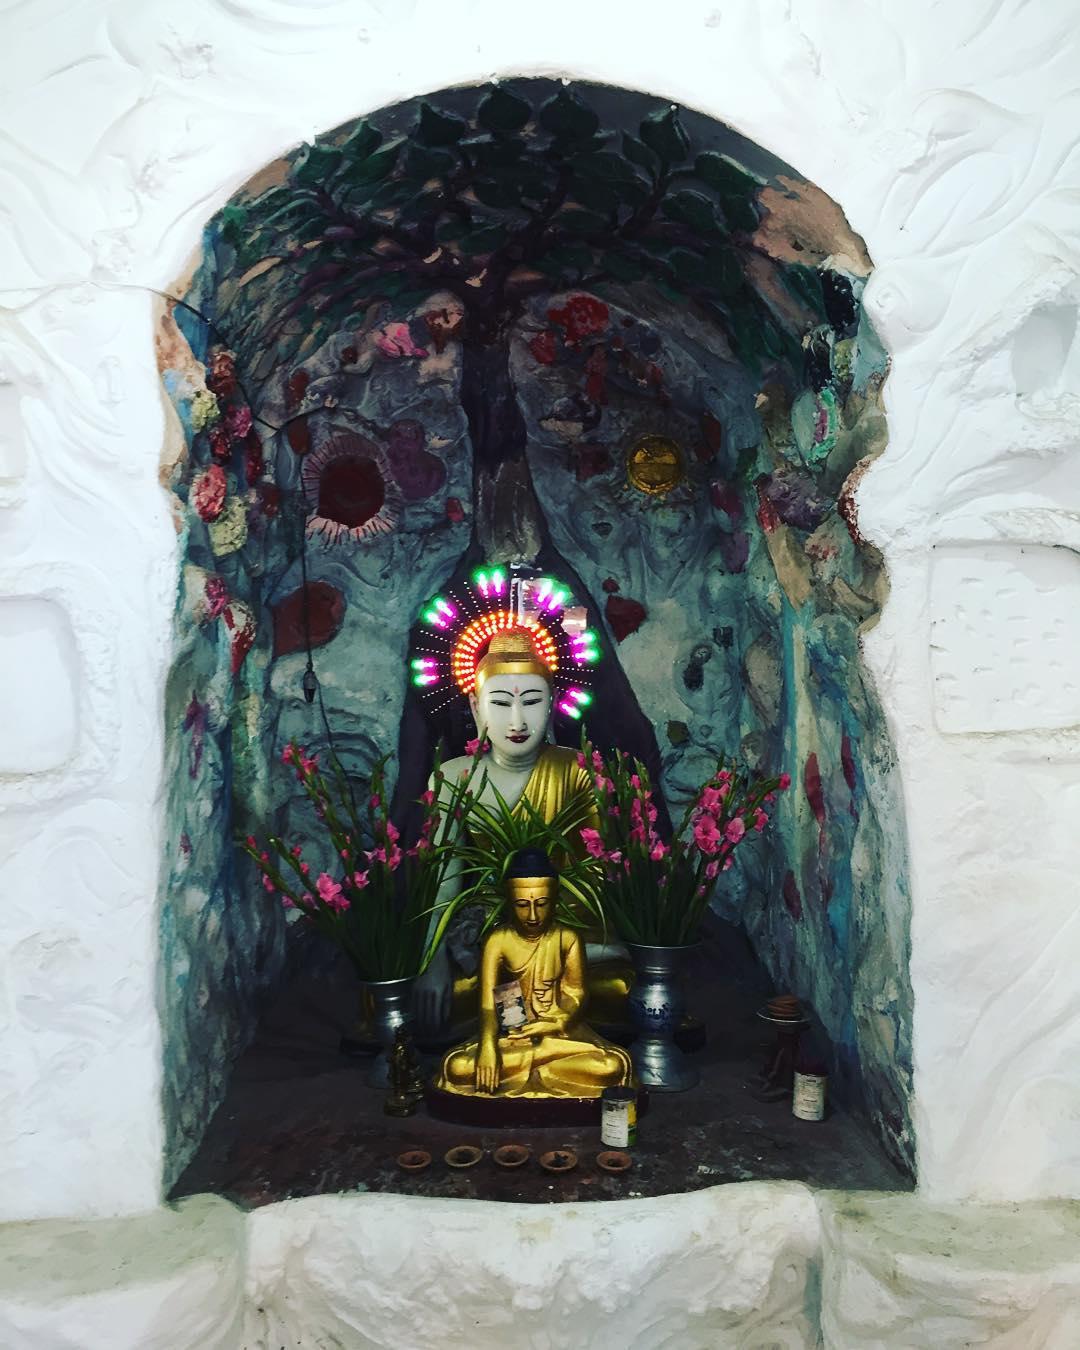 Fuerza interior #benga #myanmar #mandalay #trippingmood